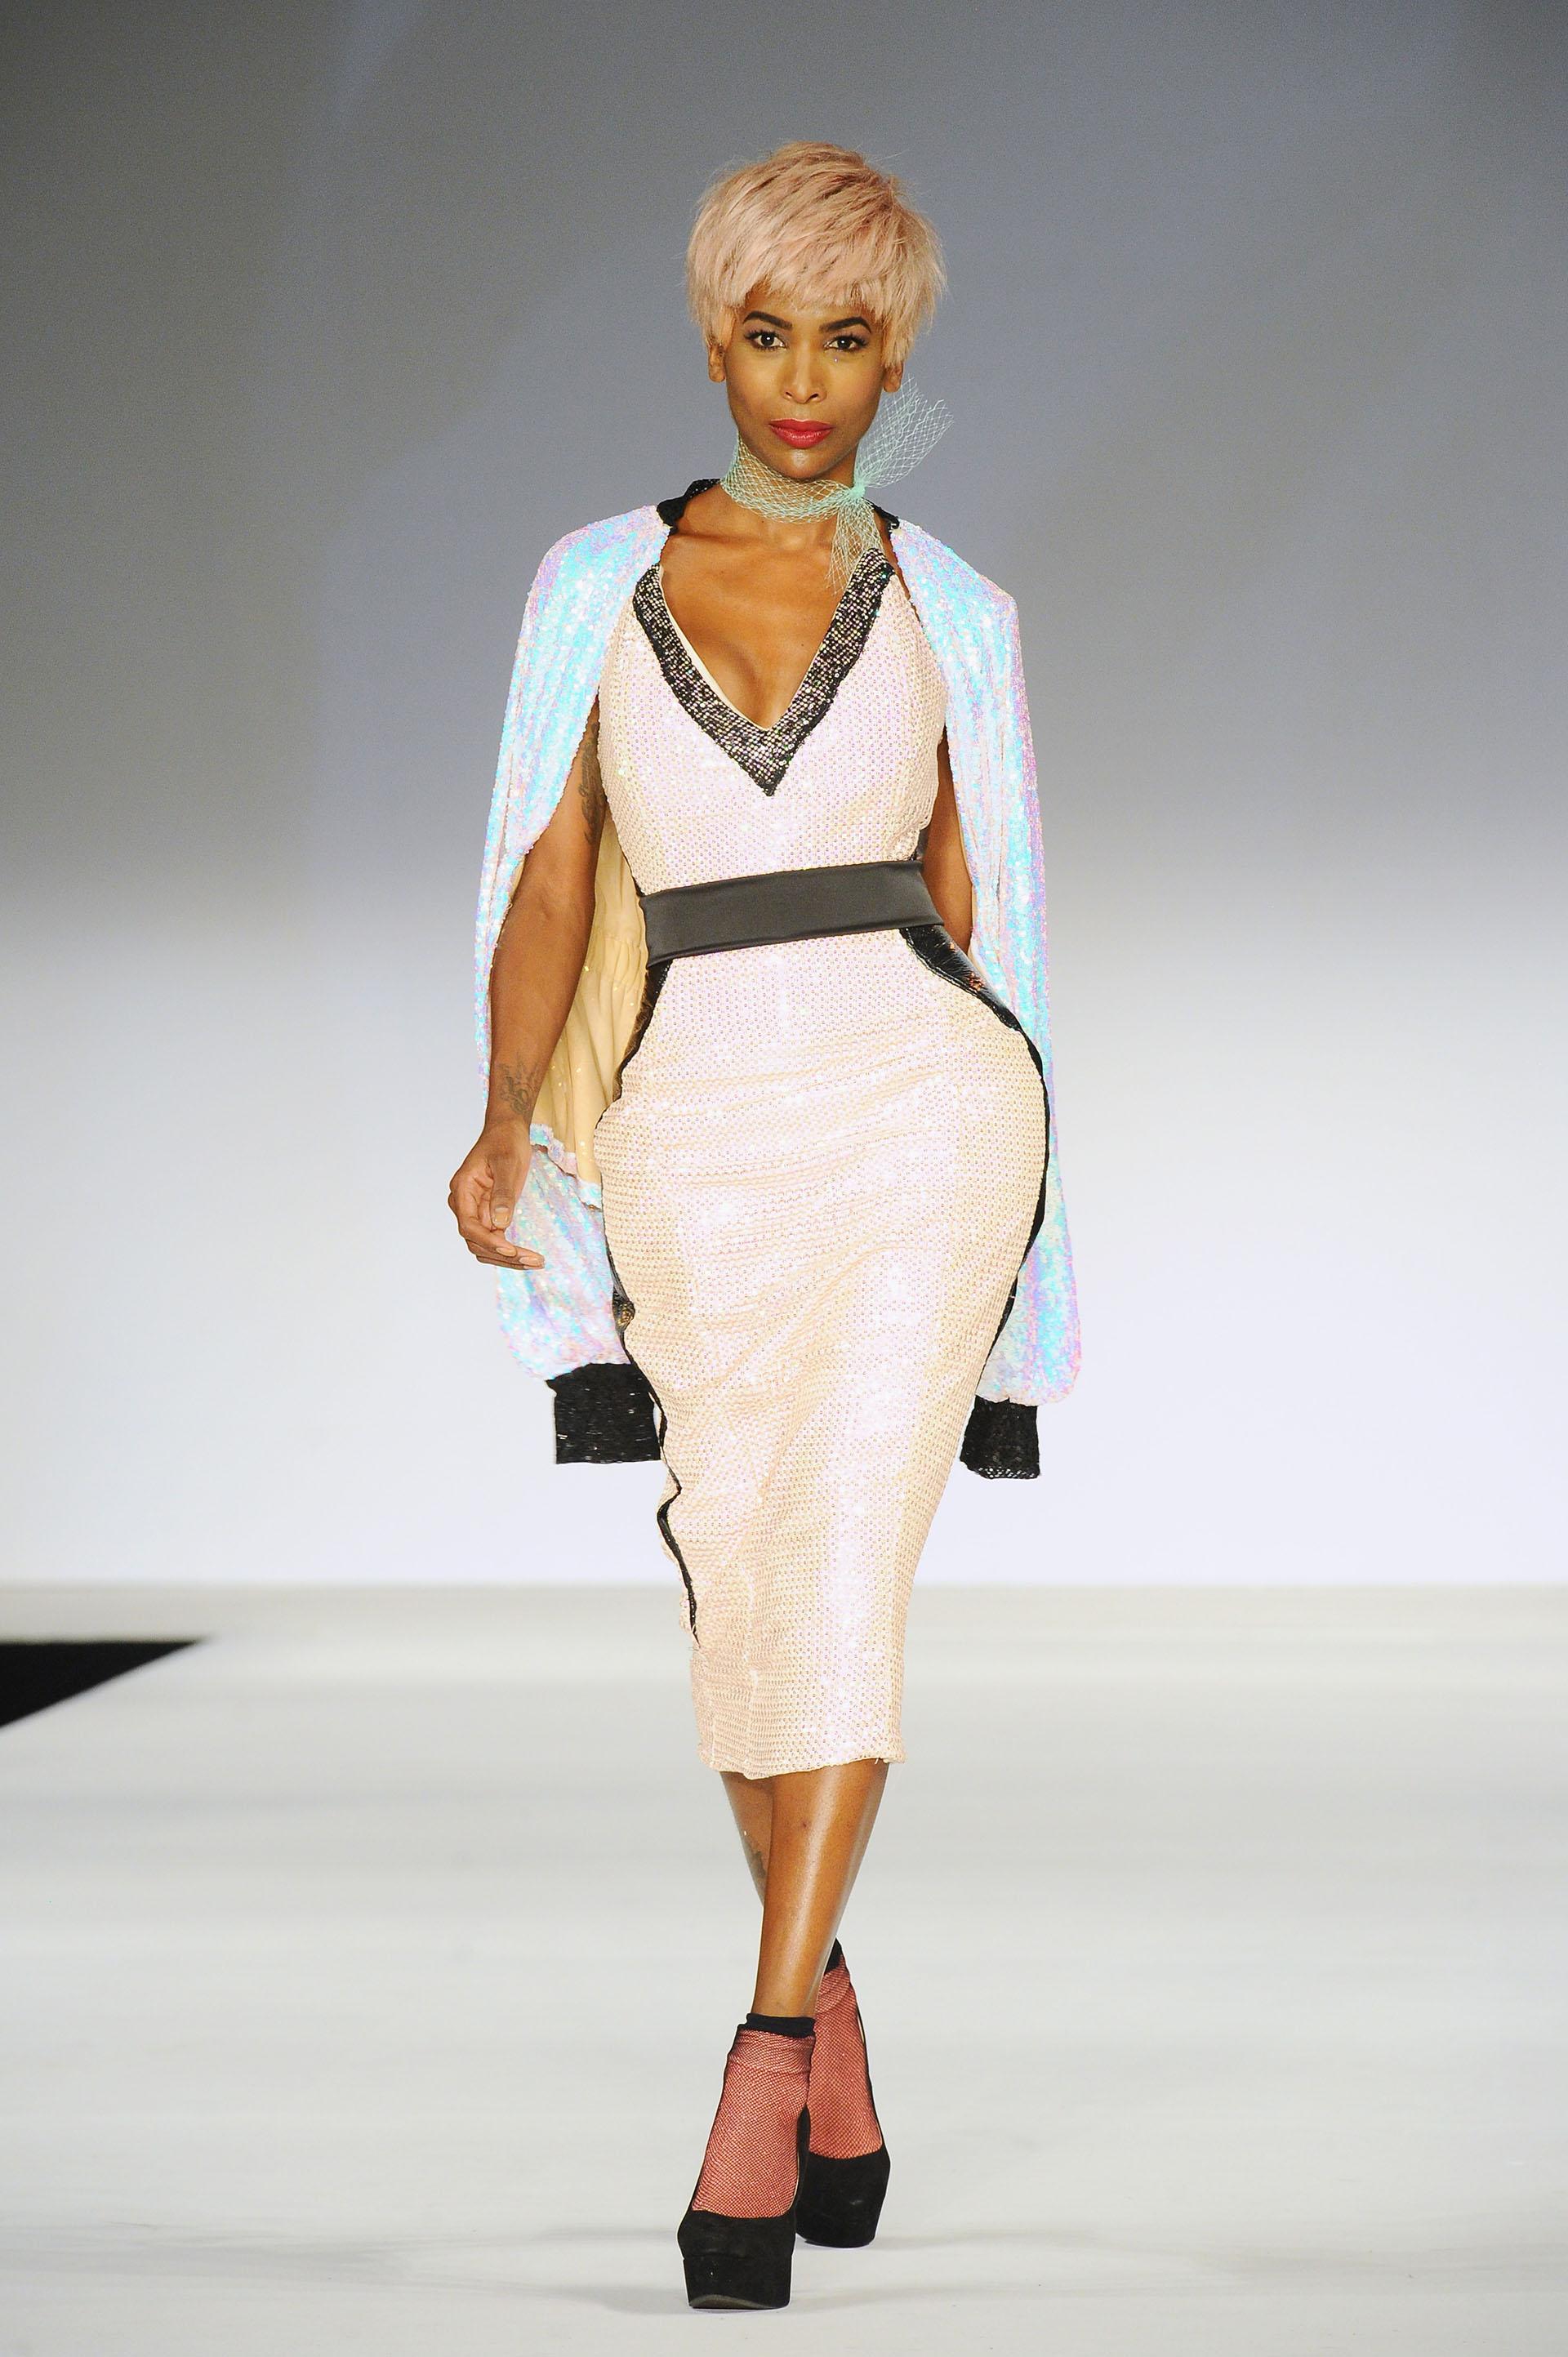 34 modelos transgénero desfilaron en el fashion show